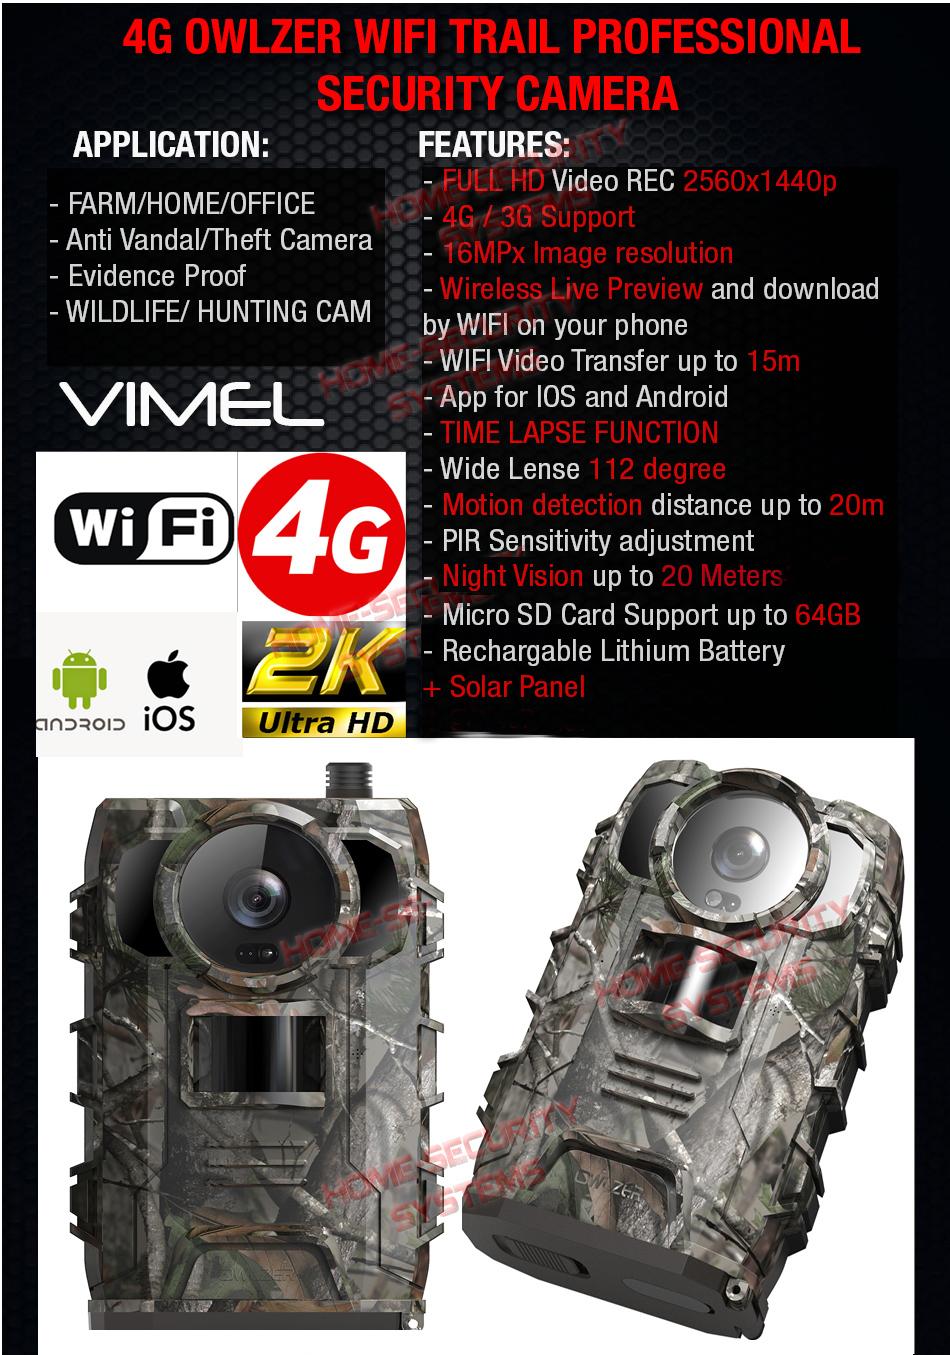 Trail Camera 4G Owlzer 2K UHD 2560x1440 3G Hunting Farm Home Night Vision Motion